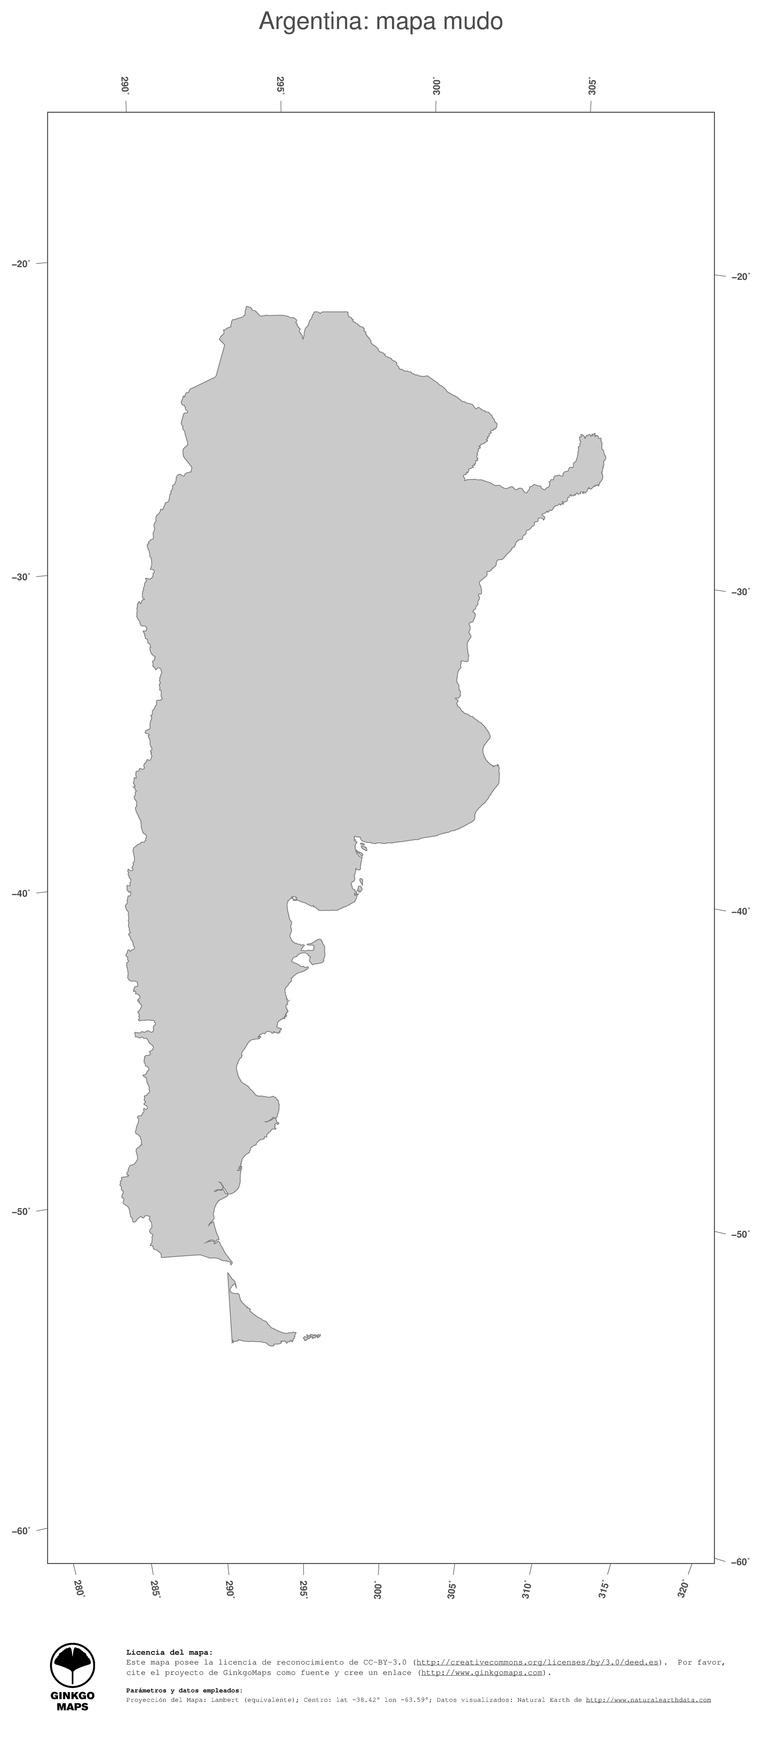 Mapa Argentina Mapas Colección Continente América Del Sur Record - Argentina mapa